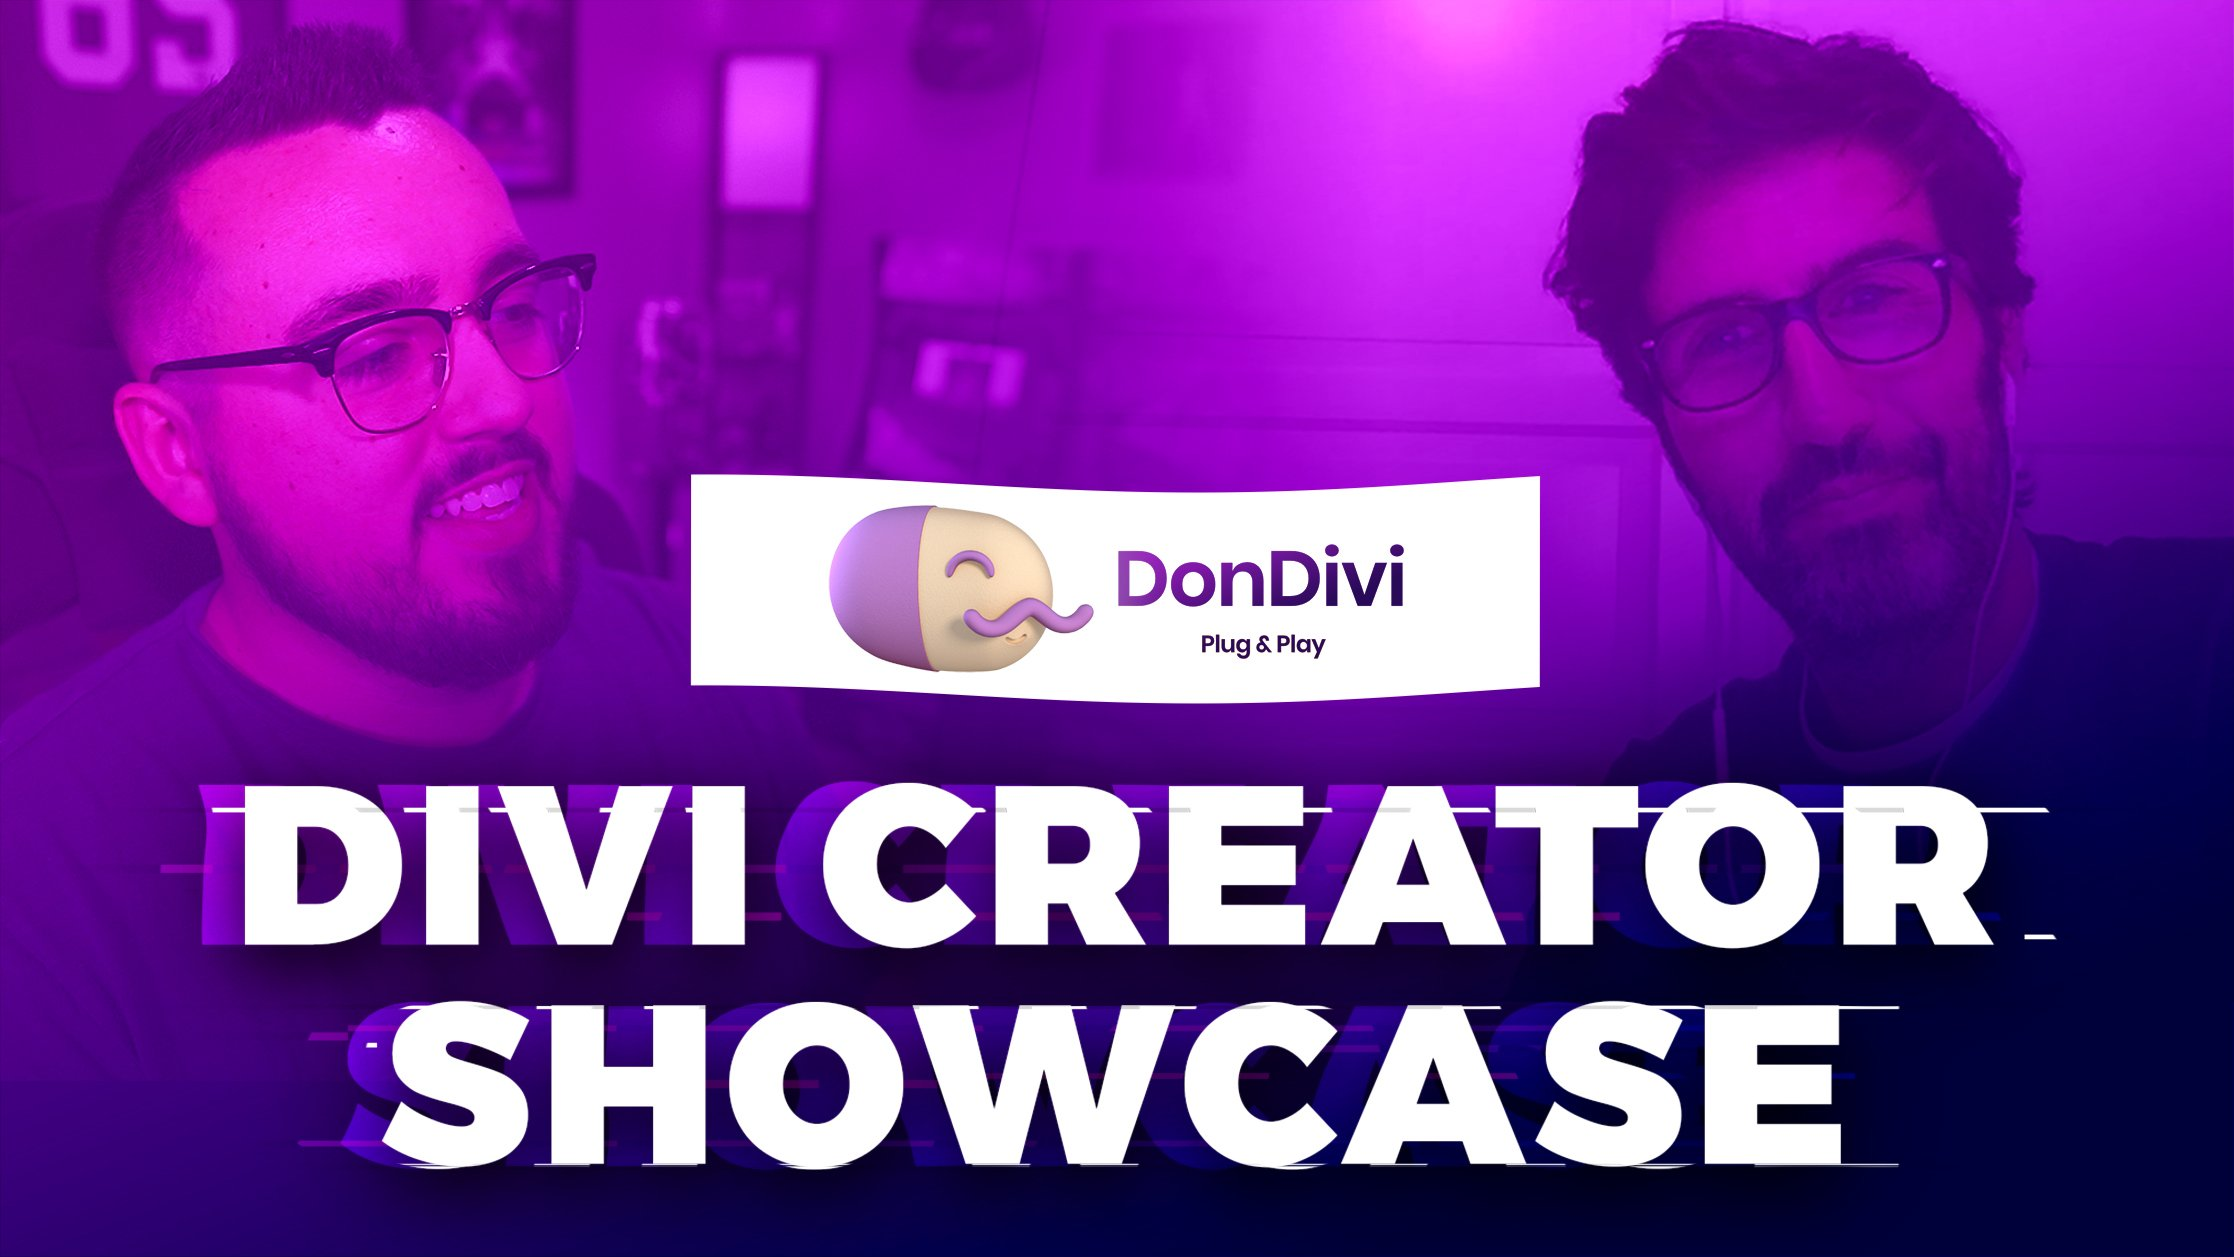 Divi Creator Showcase: DonDivi